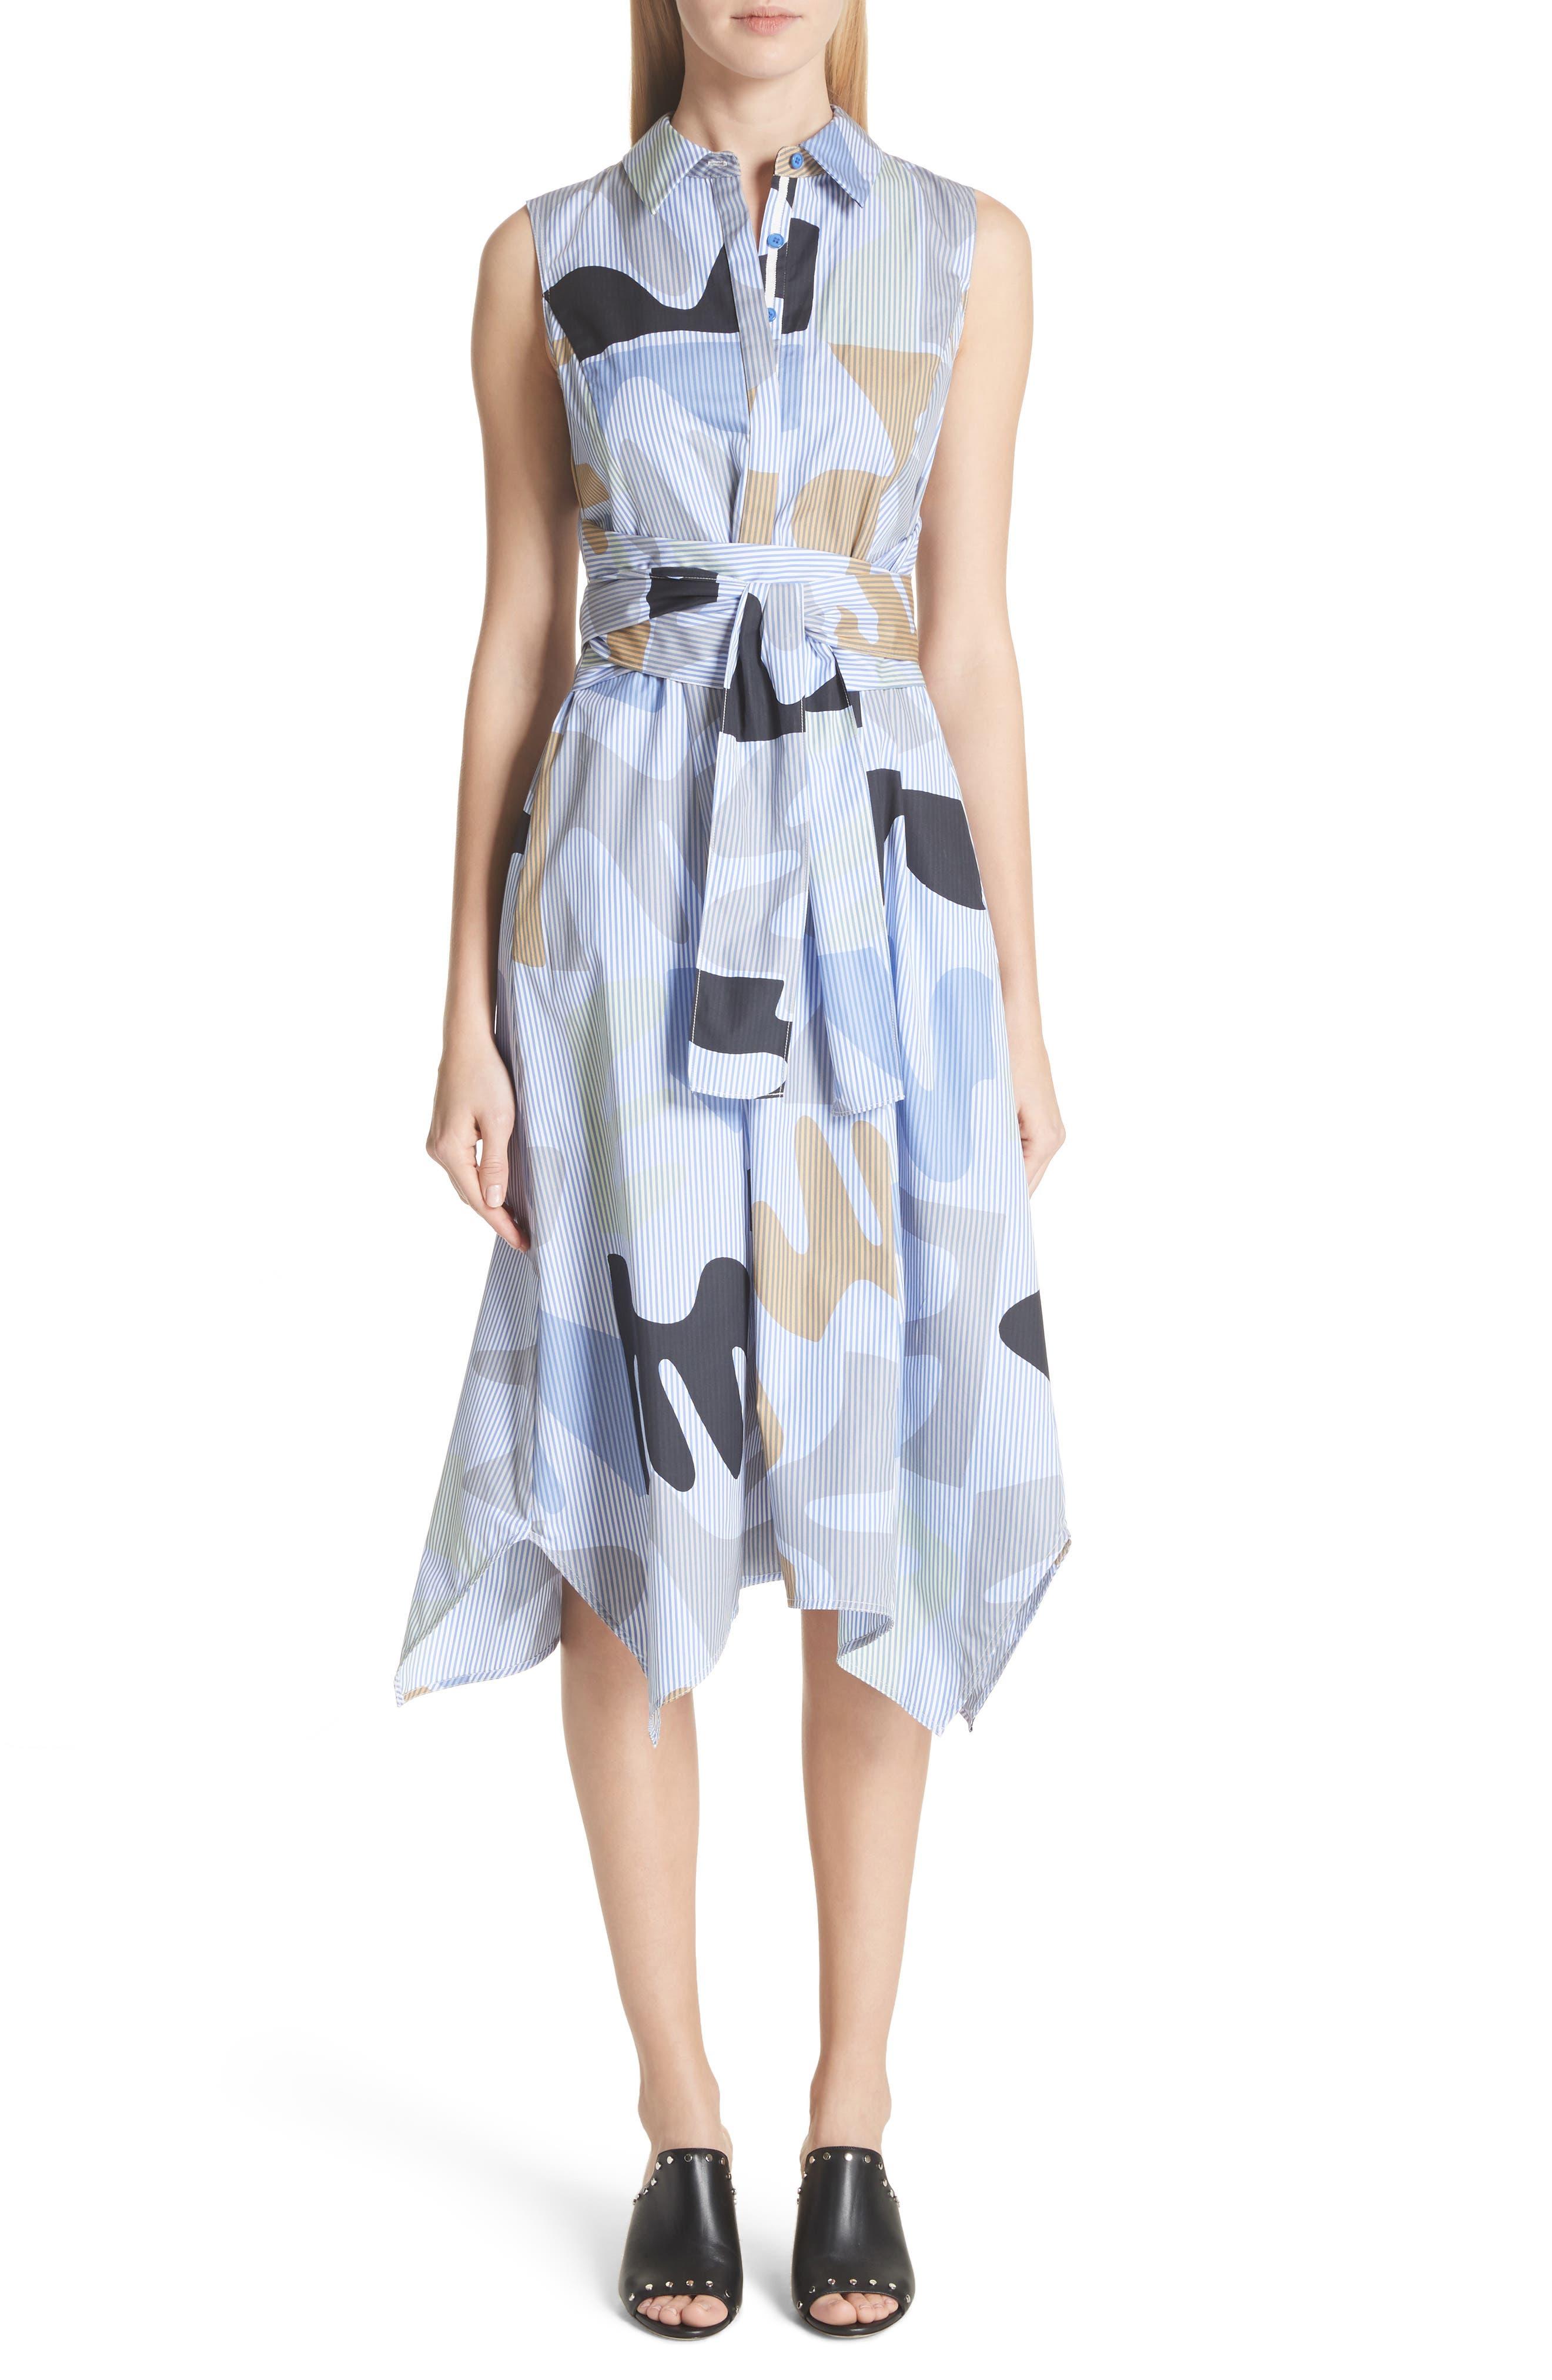 Cordelia Urban Ethos Stripe Dress,                             Main thumbnail 1, color,                             Periwinkle Multi